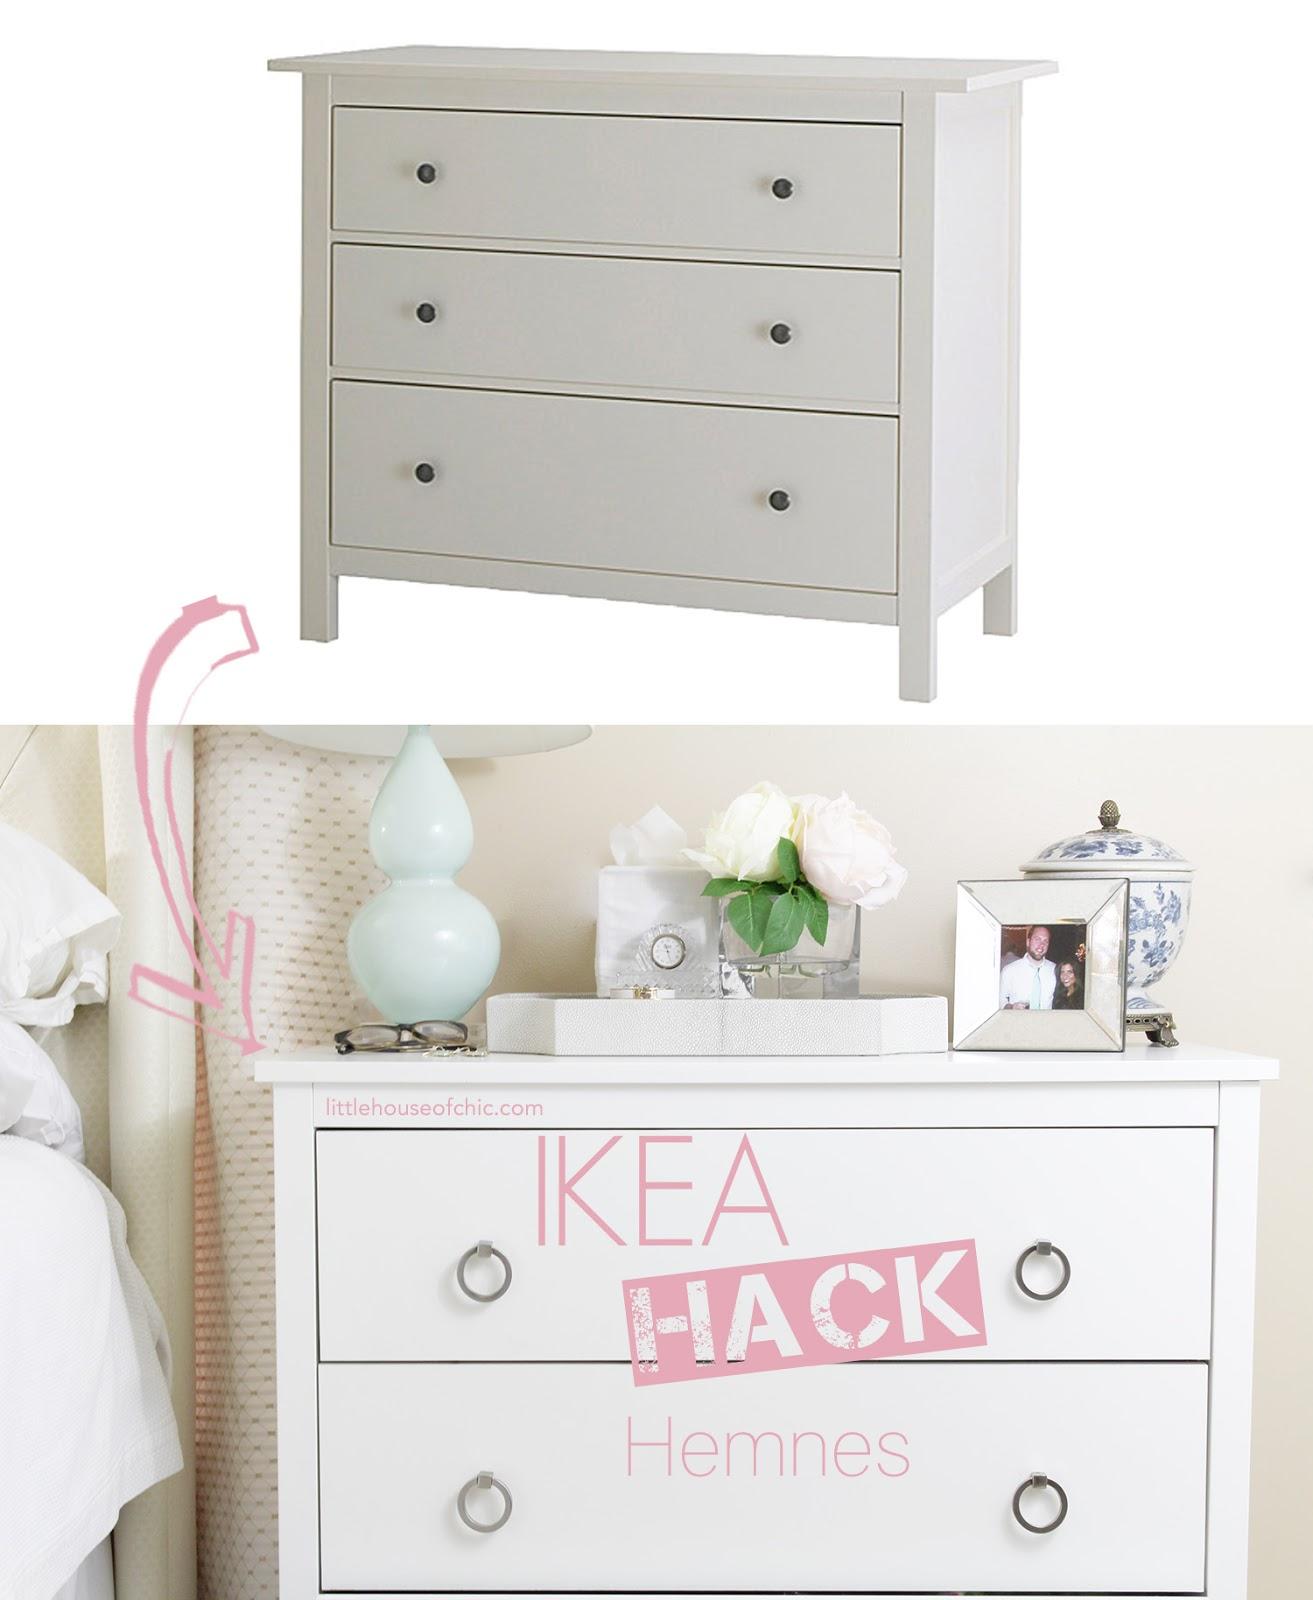 Ikea Hack Hemnes Little House of